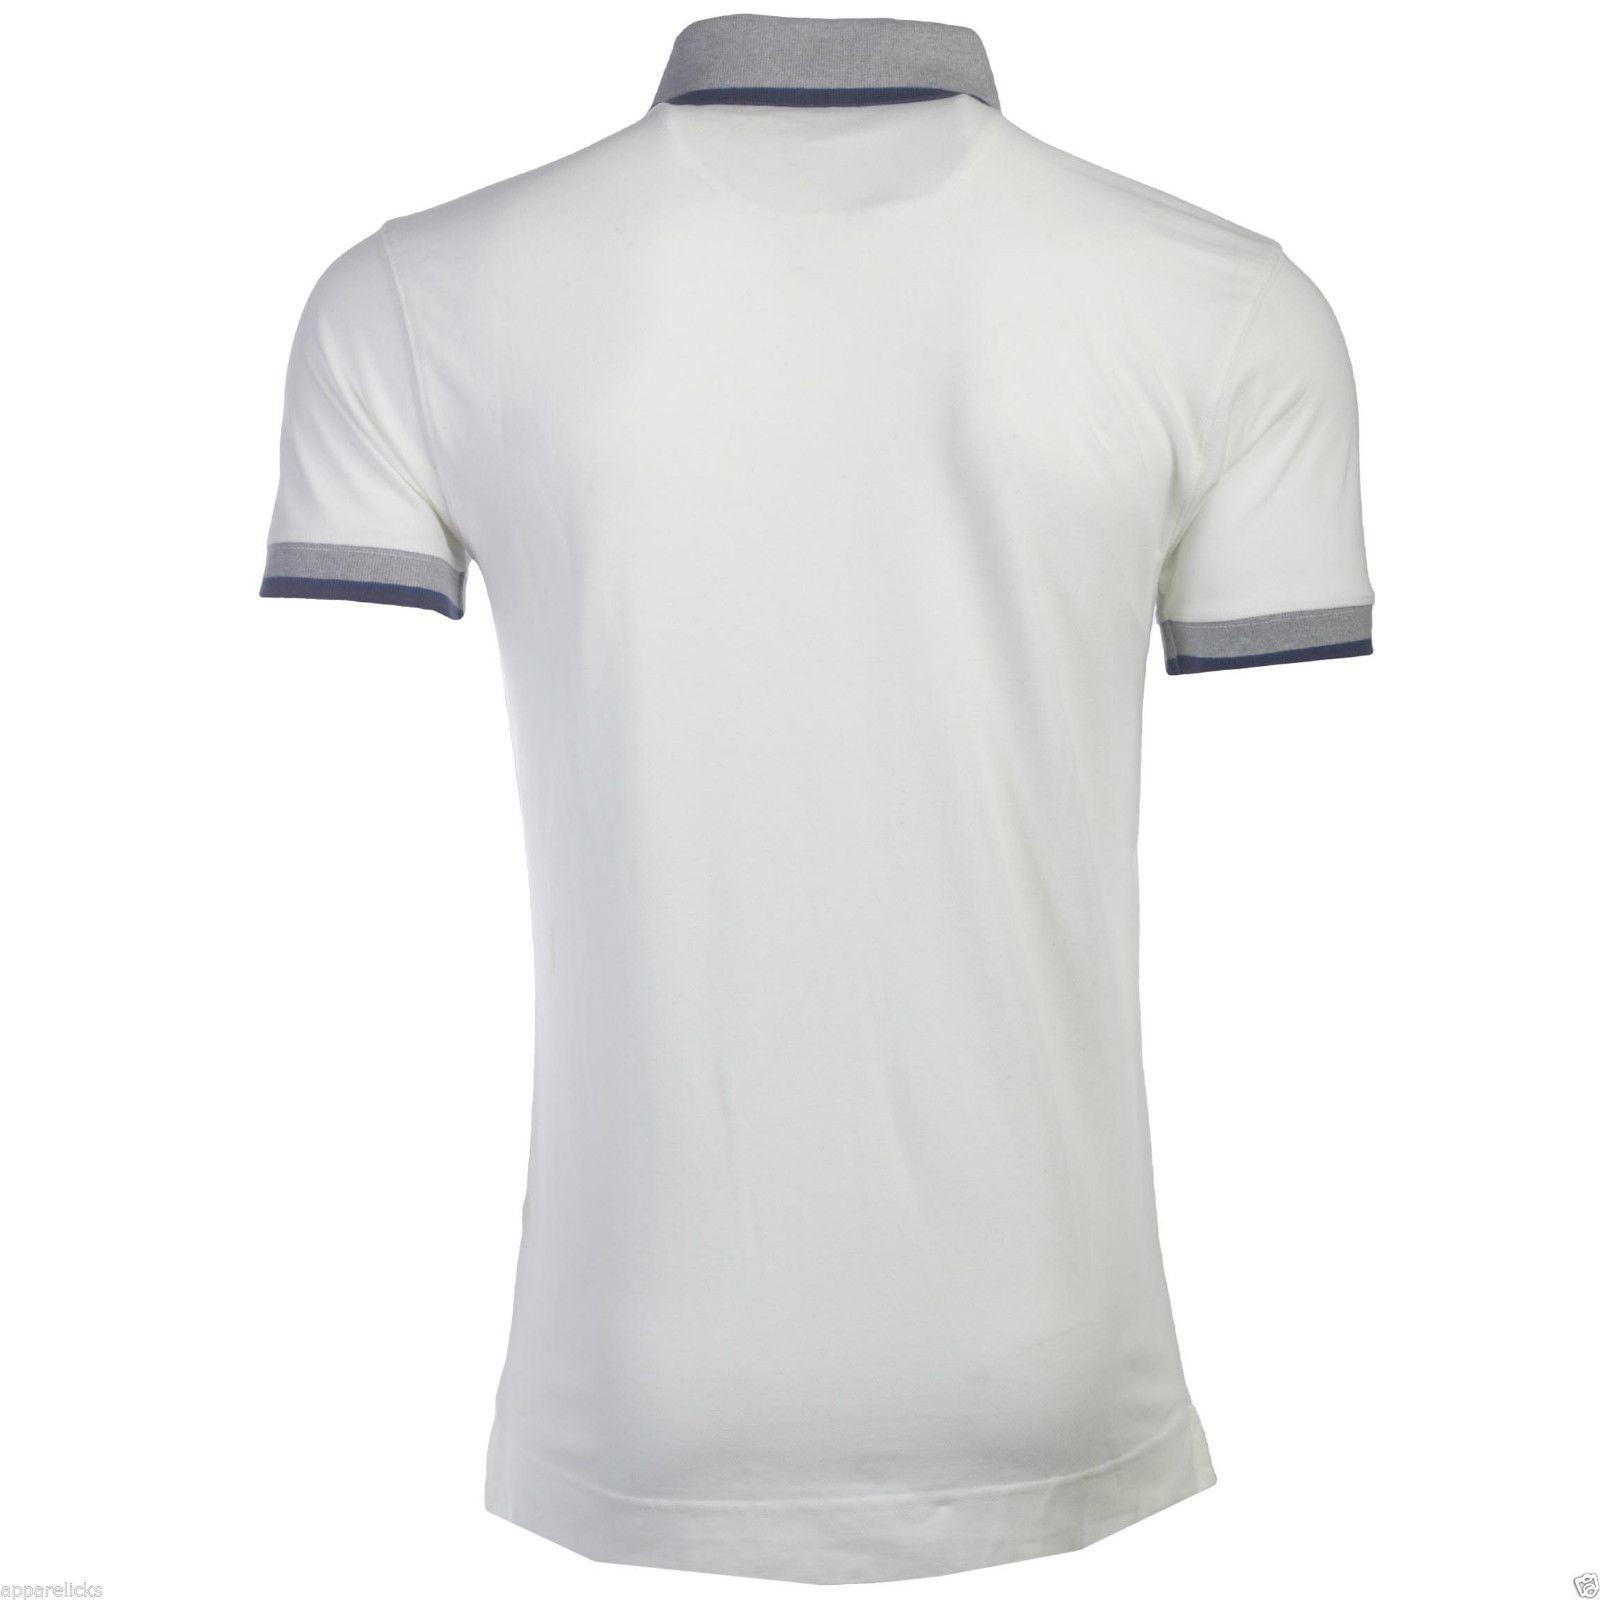 Gas mens button down short sleeves casual shirts top shirt for Mens casual short sleeve button down shirts